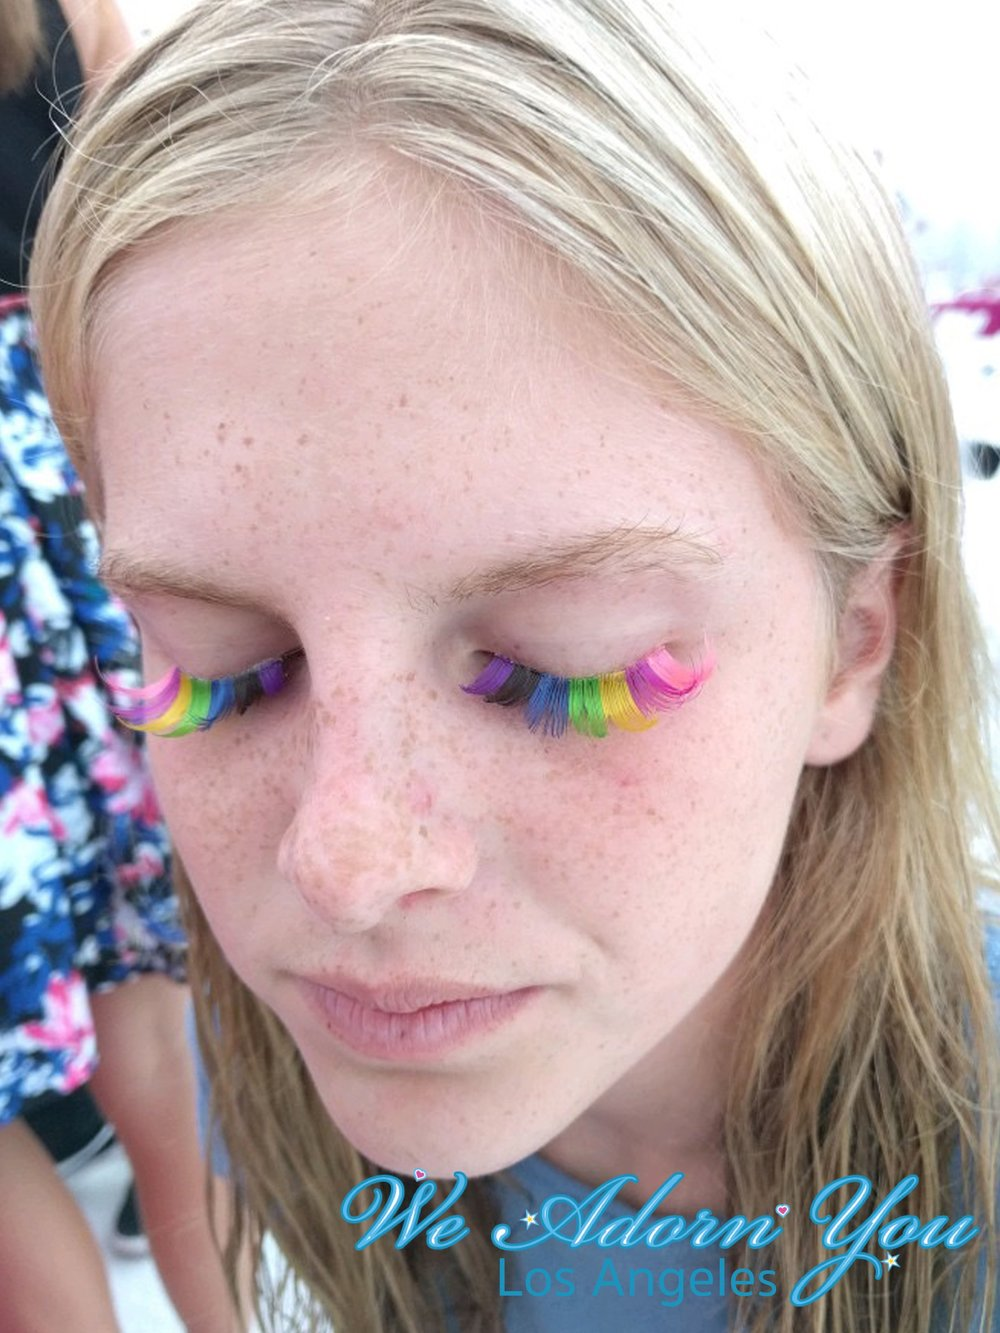 We Adorn You Los Angeles party eyelashes rainbow.jpg